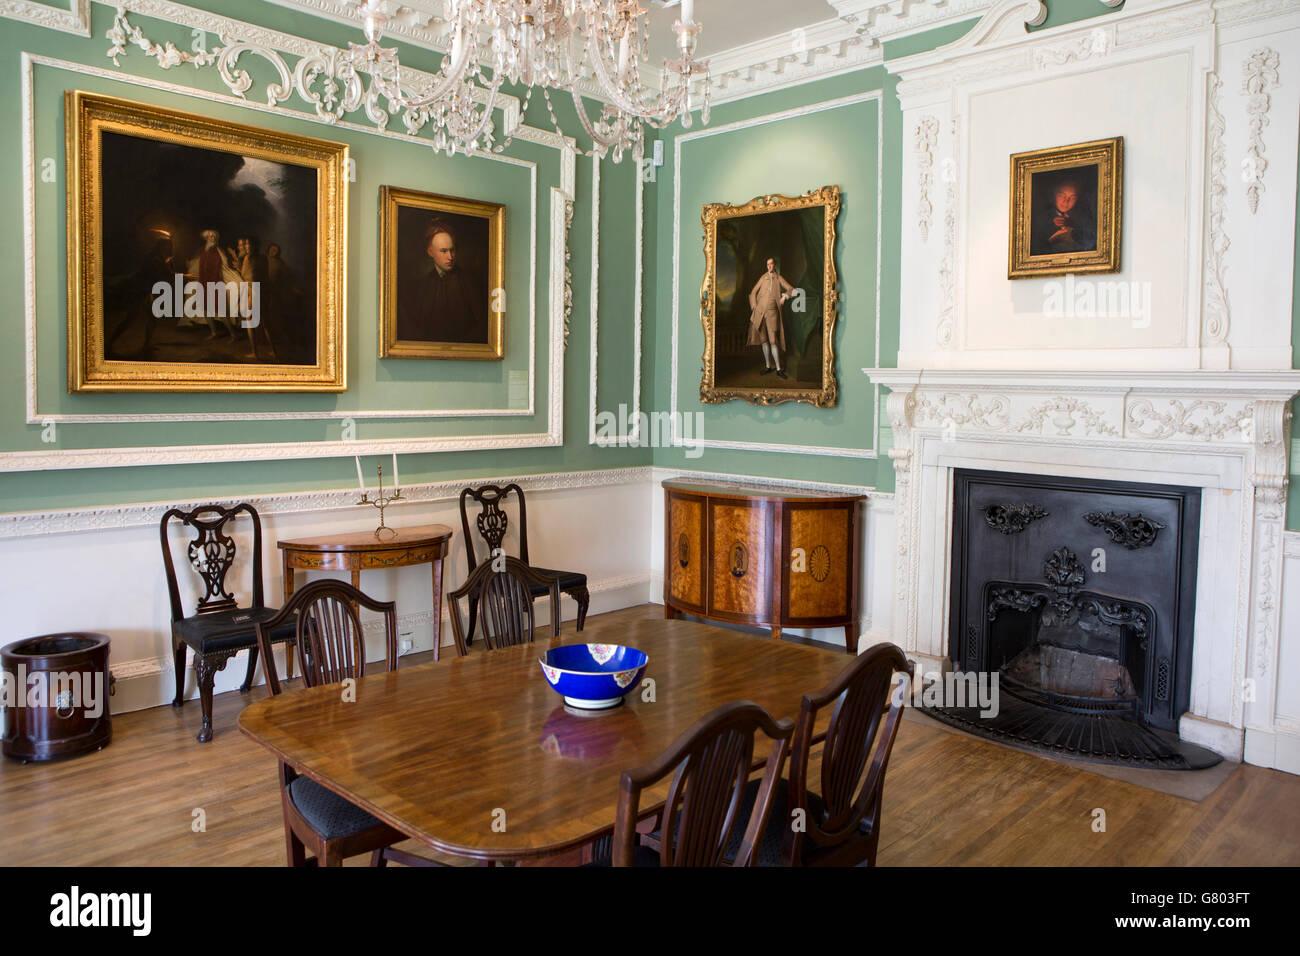 UK Cumbria Kendal Abbot Hall Art Gallery Interior Room